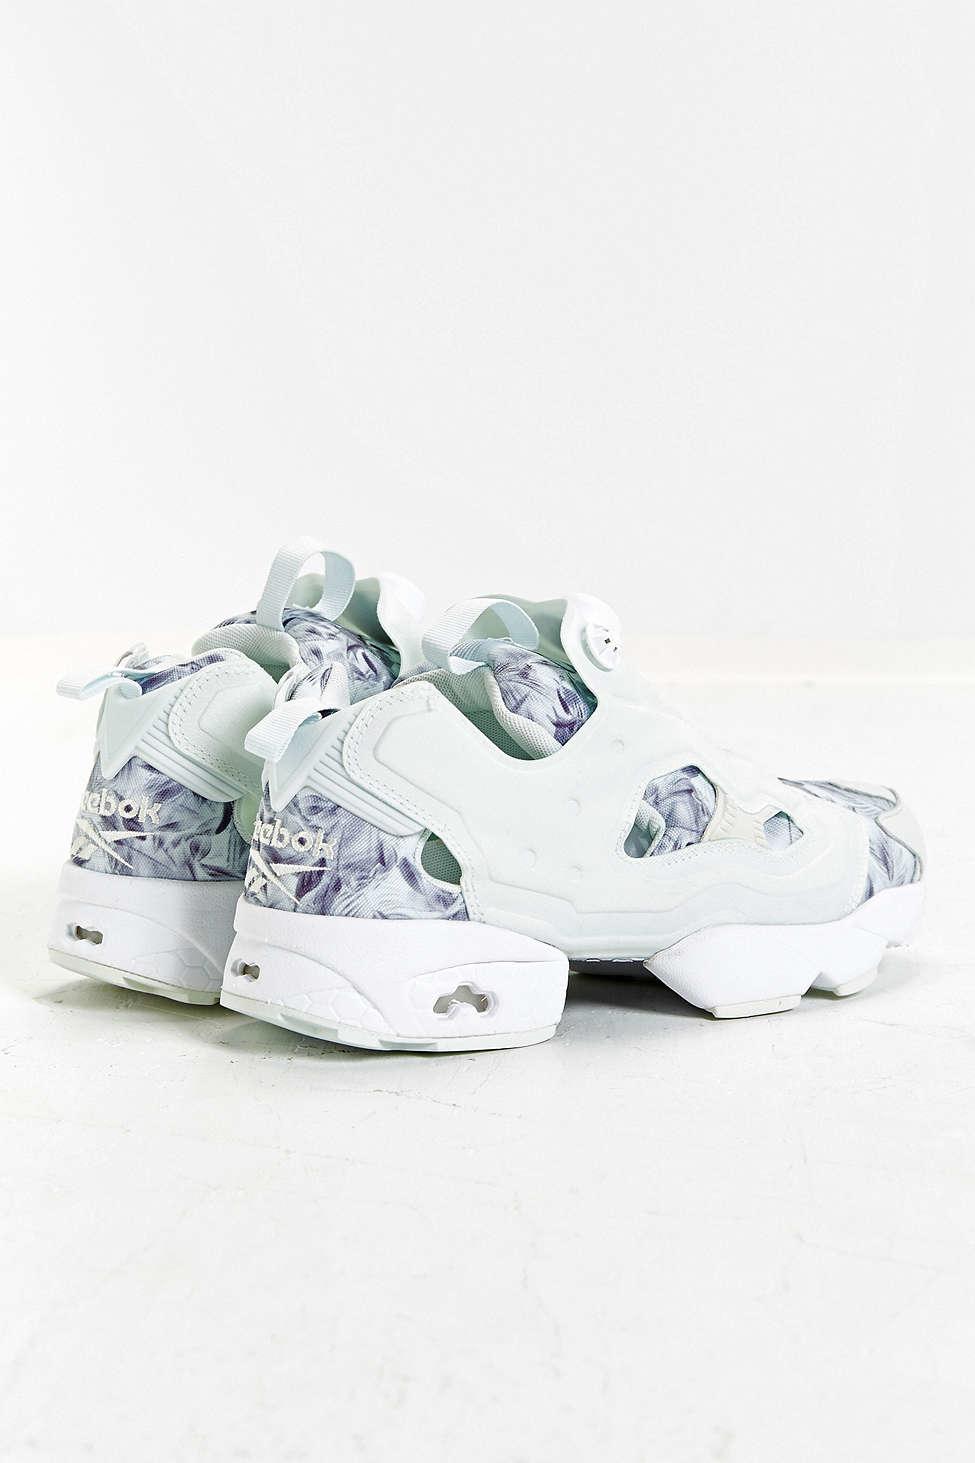 ca0c807c7a6ccf Lyst - Reebok Instapump Fury Sg Sneaker in Gray for Men